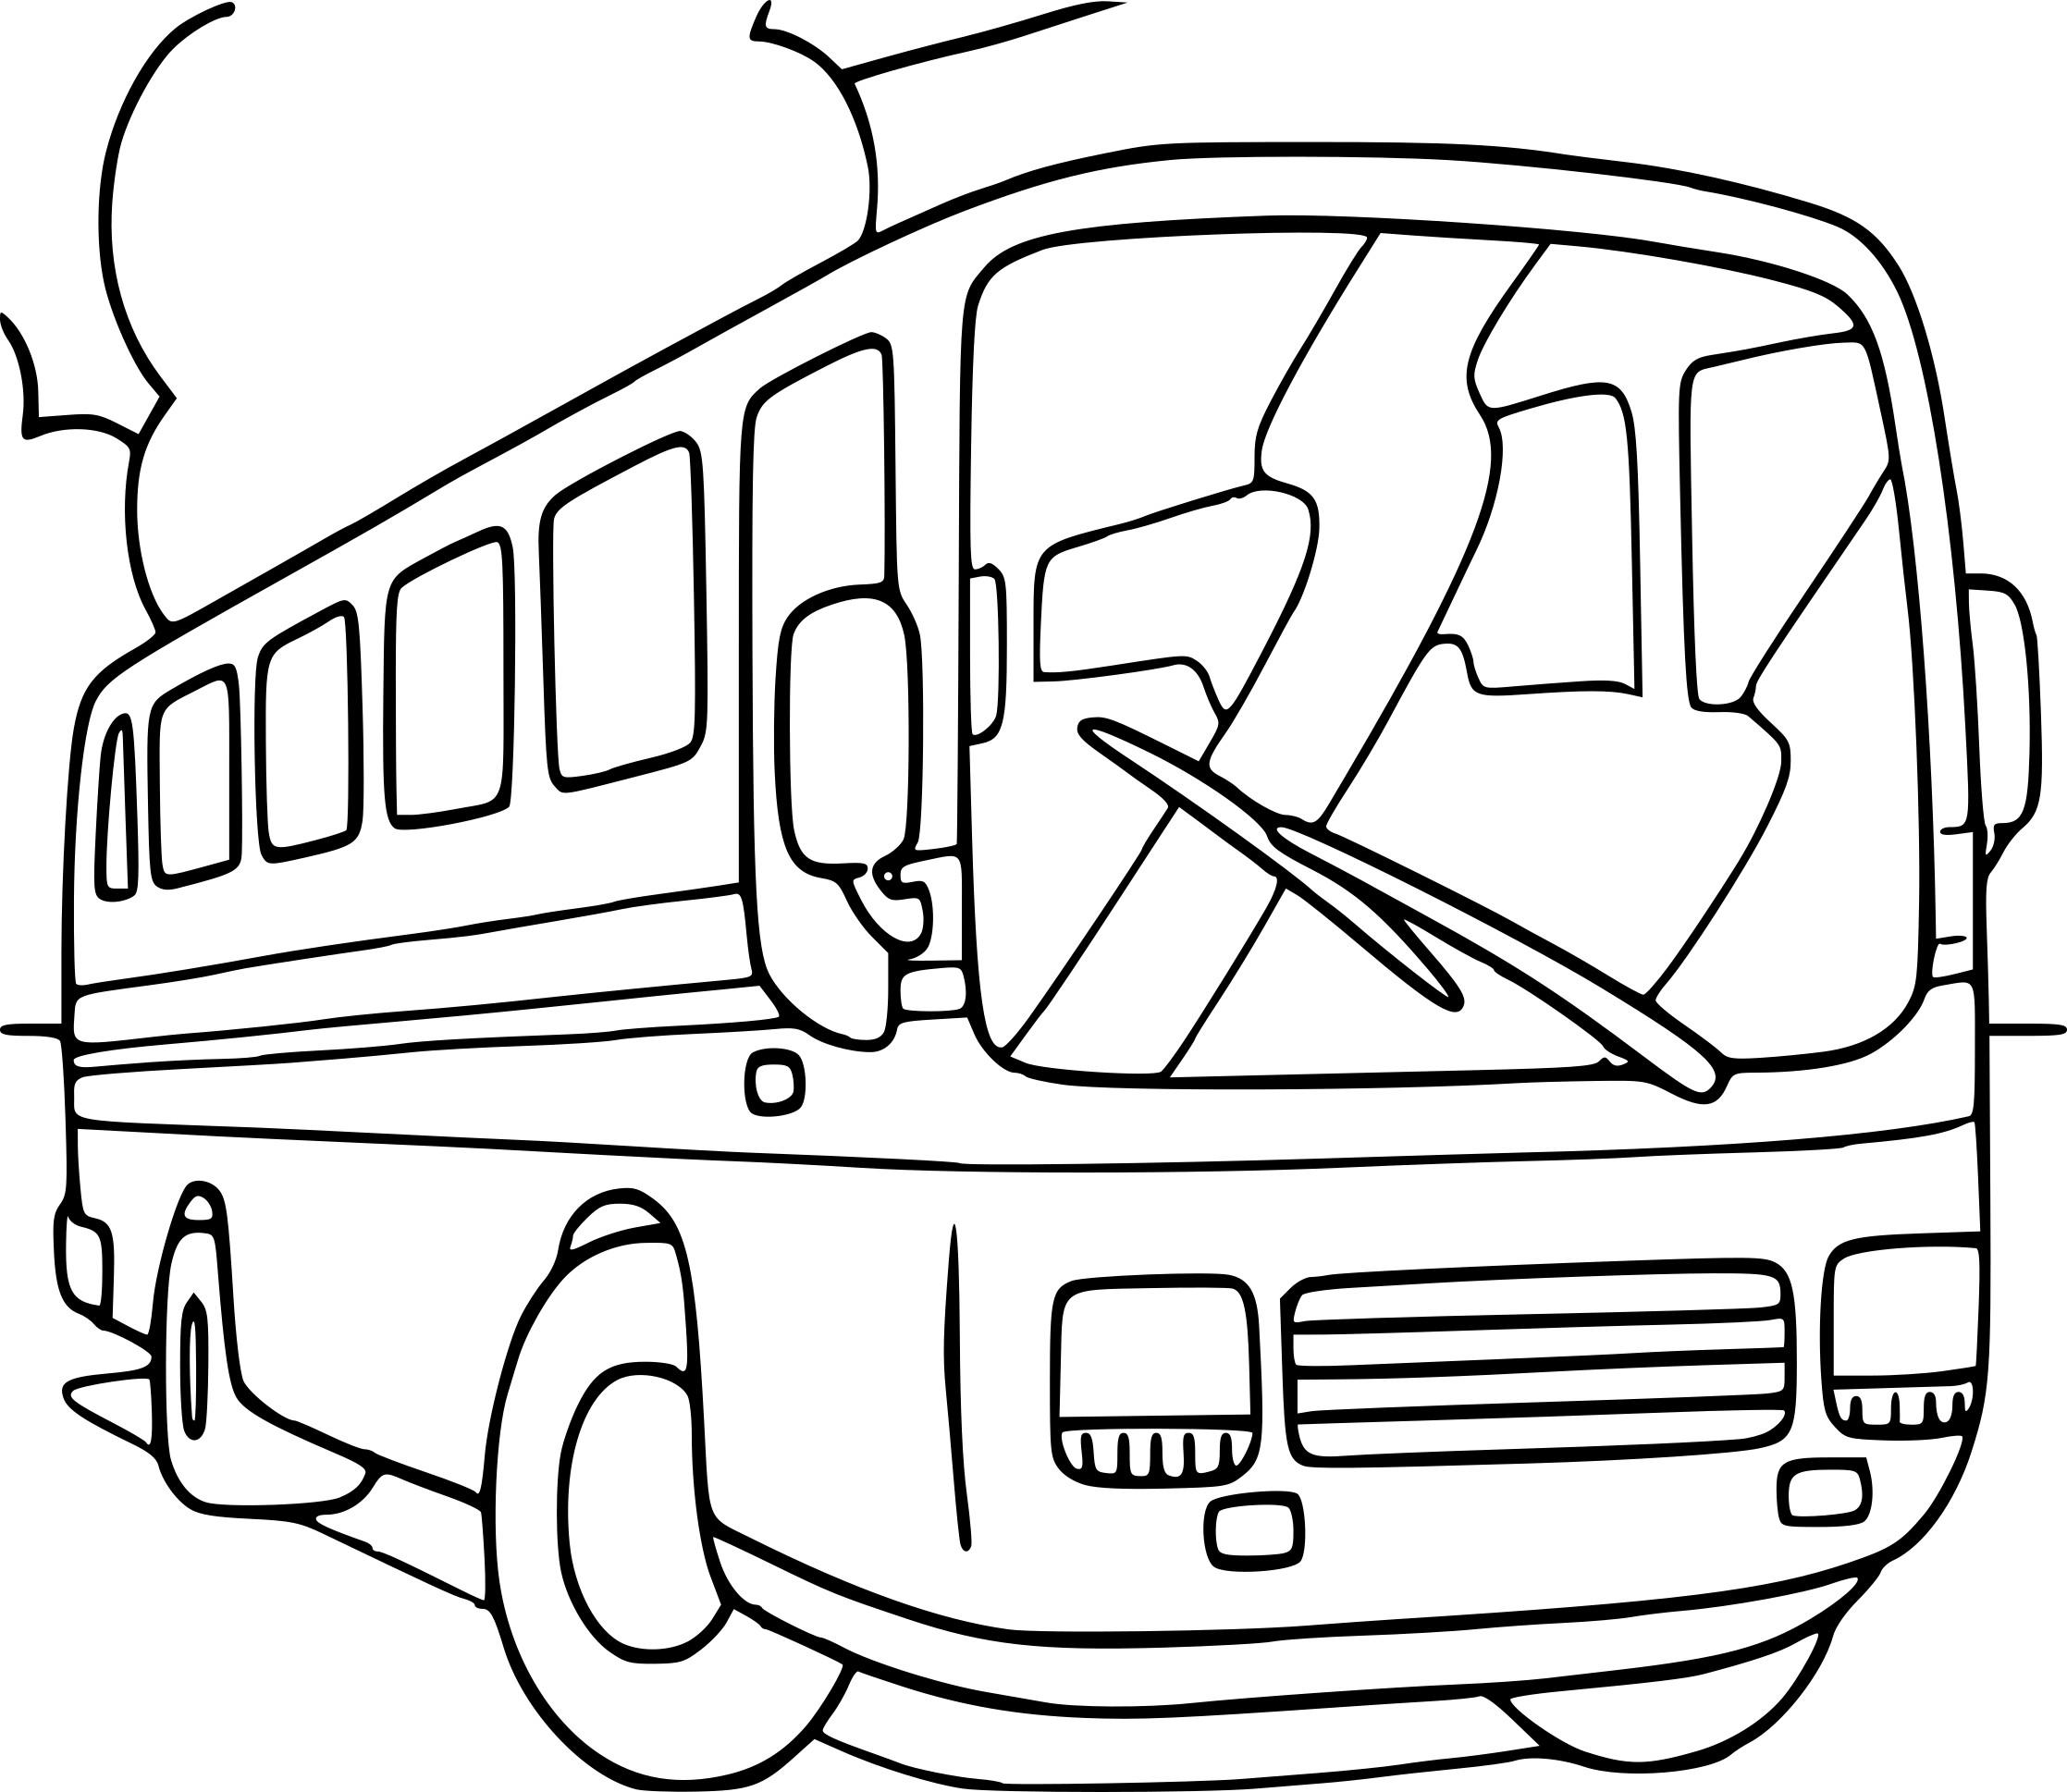 Coloriage autobus gratuit imprimer - Autobus scolaire dessin ...